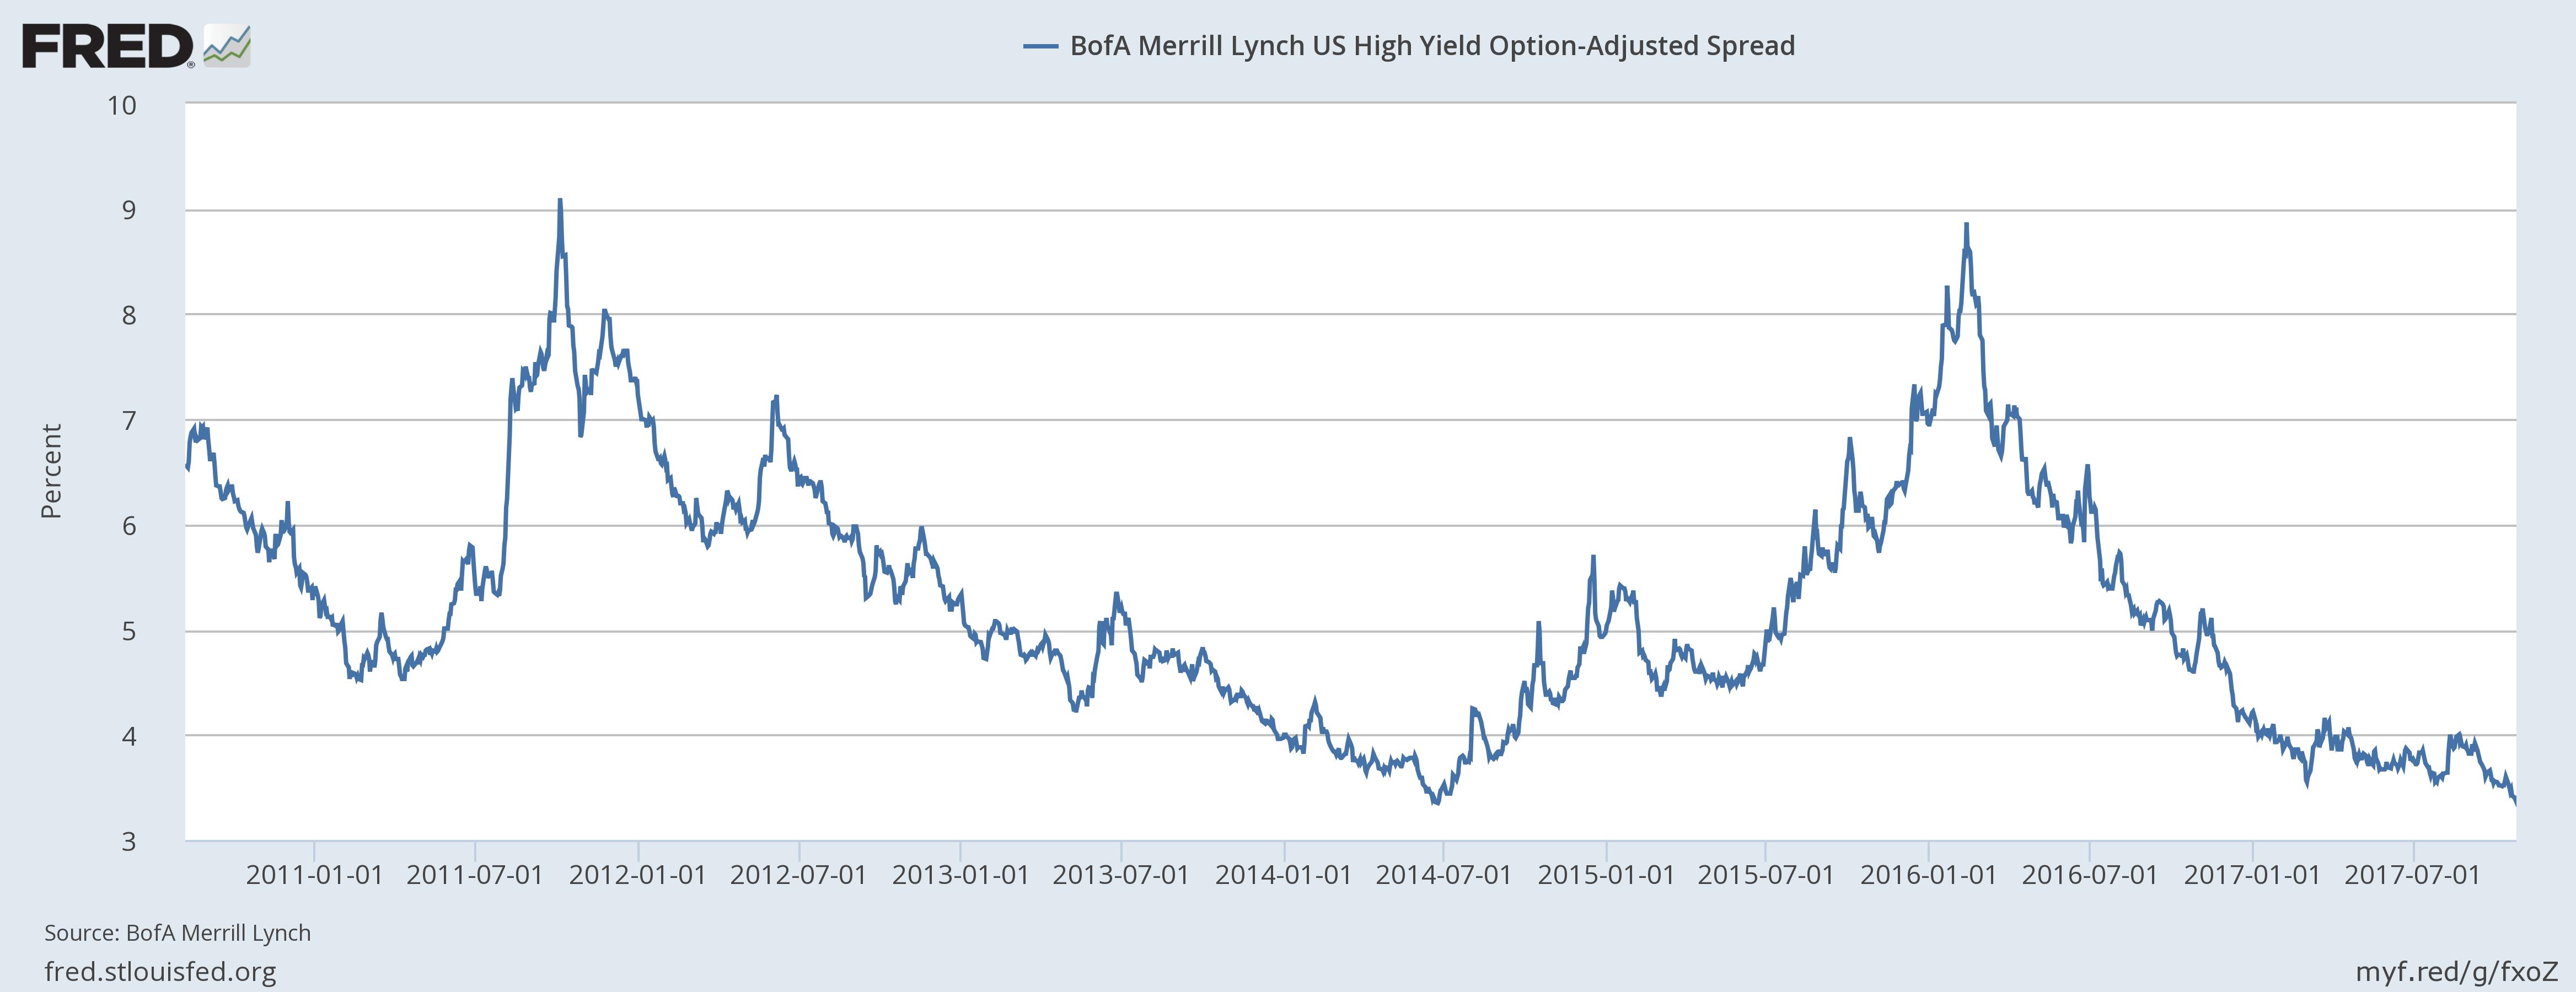 US BofA Merrill Lynch High Yield Option, Jan 2011 - Jul 2017